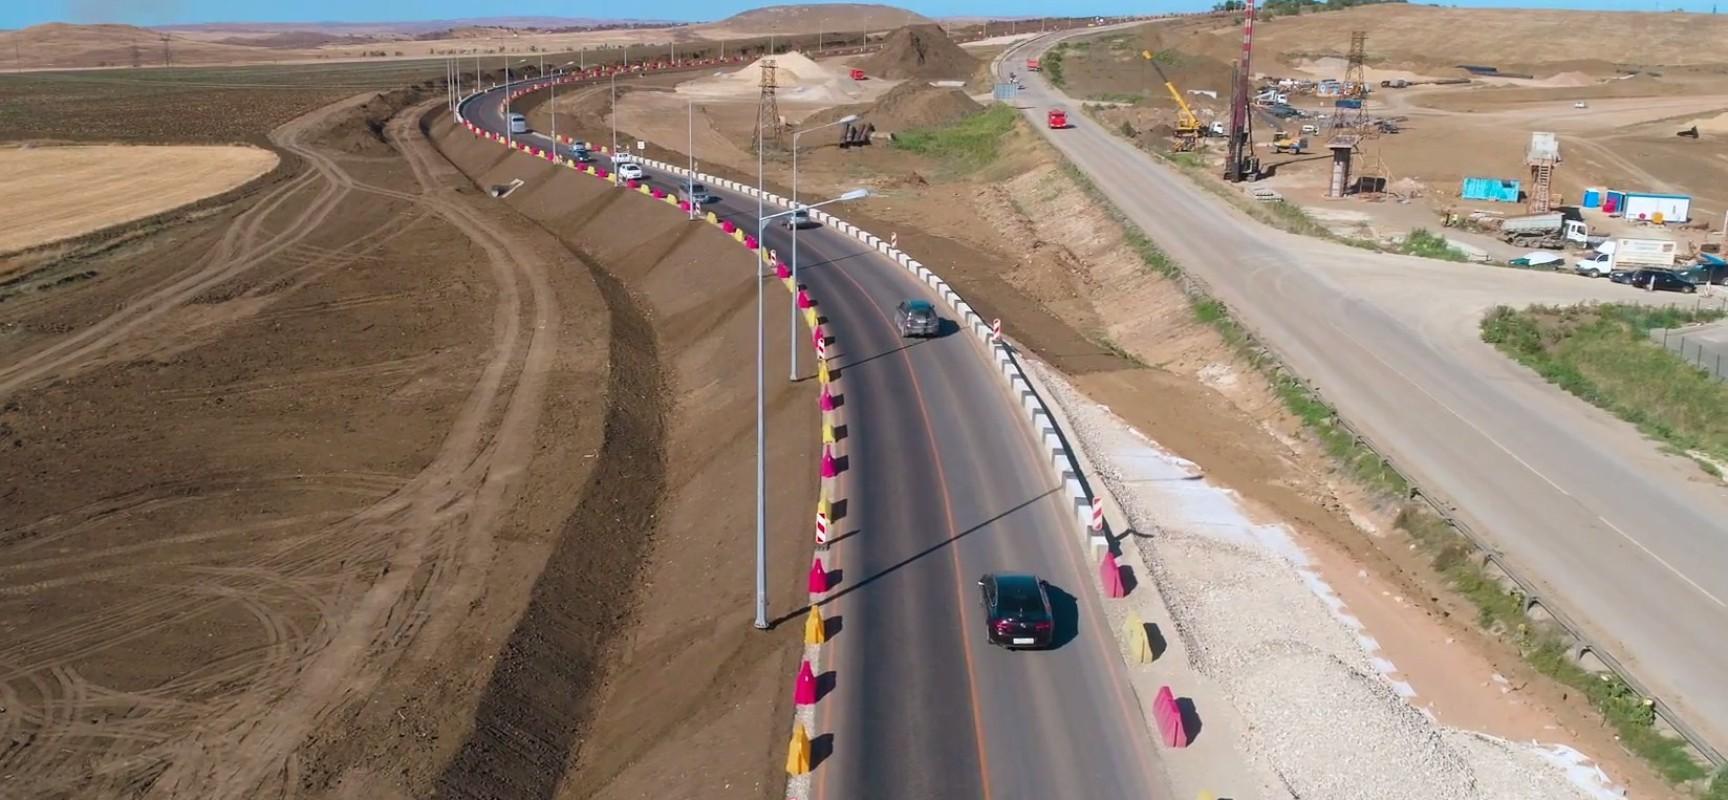 Трасса «Таврида». Развязка Керчь 9 километр с квадрокоптера,  август 2017